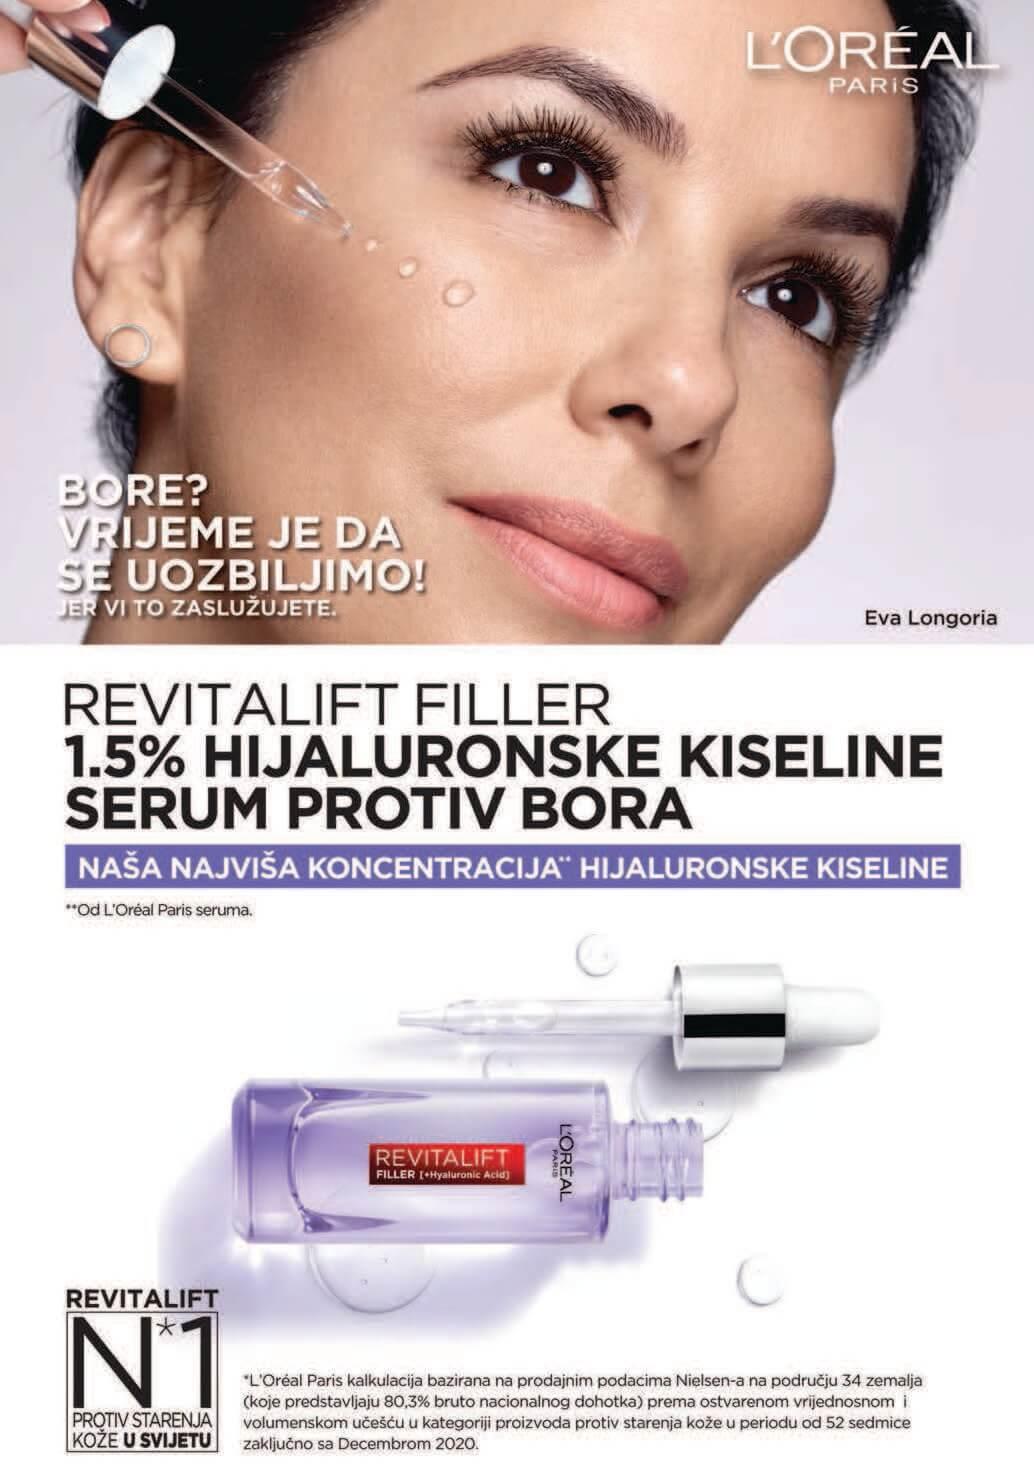 DM Katalog BiH JUN 2021 09.06. 22.06. eKatalozi.com PR Page 10